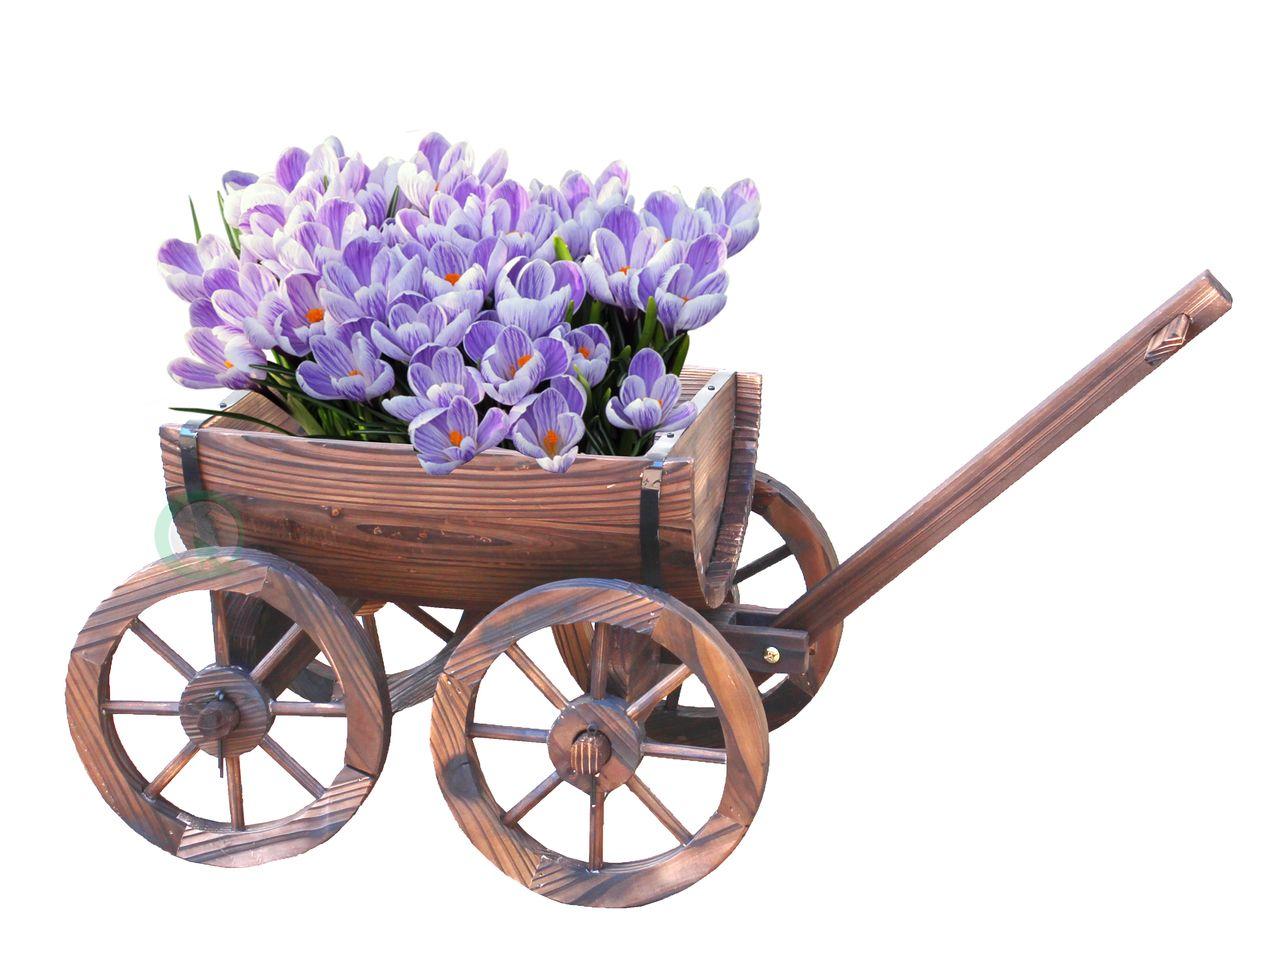 Half Barrel Wagon Planter Wagon planter, Wheelbarrow